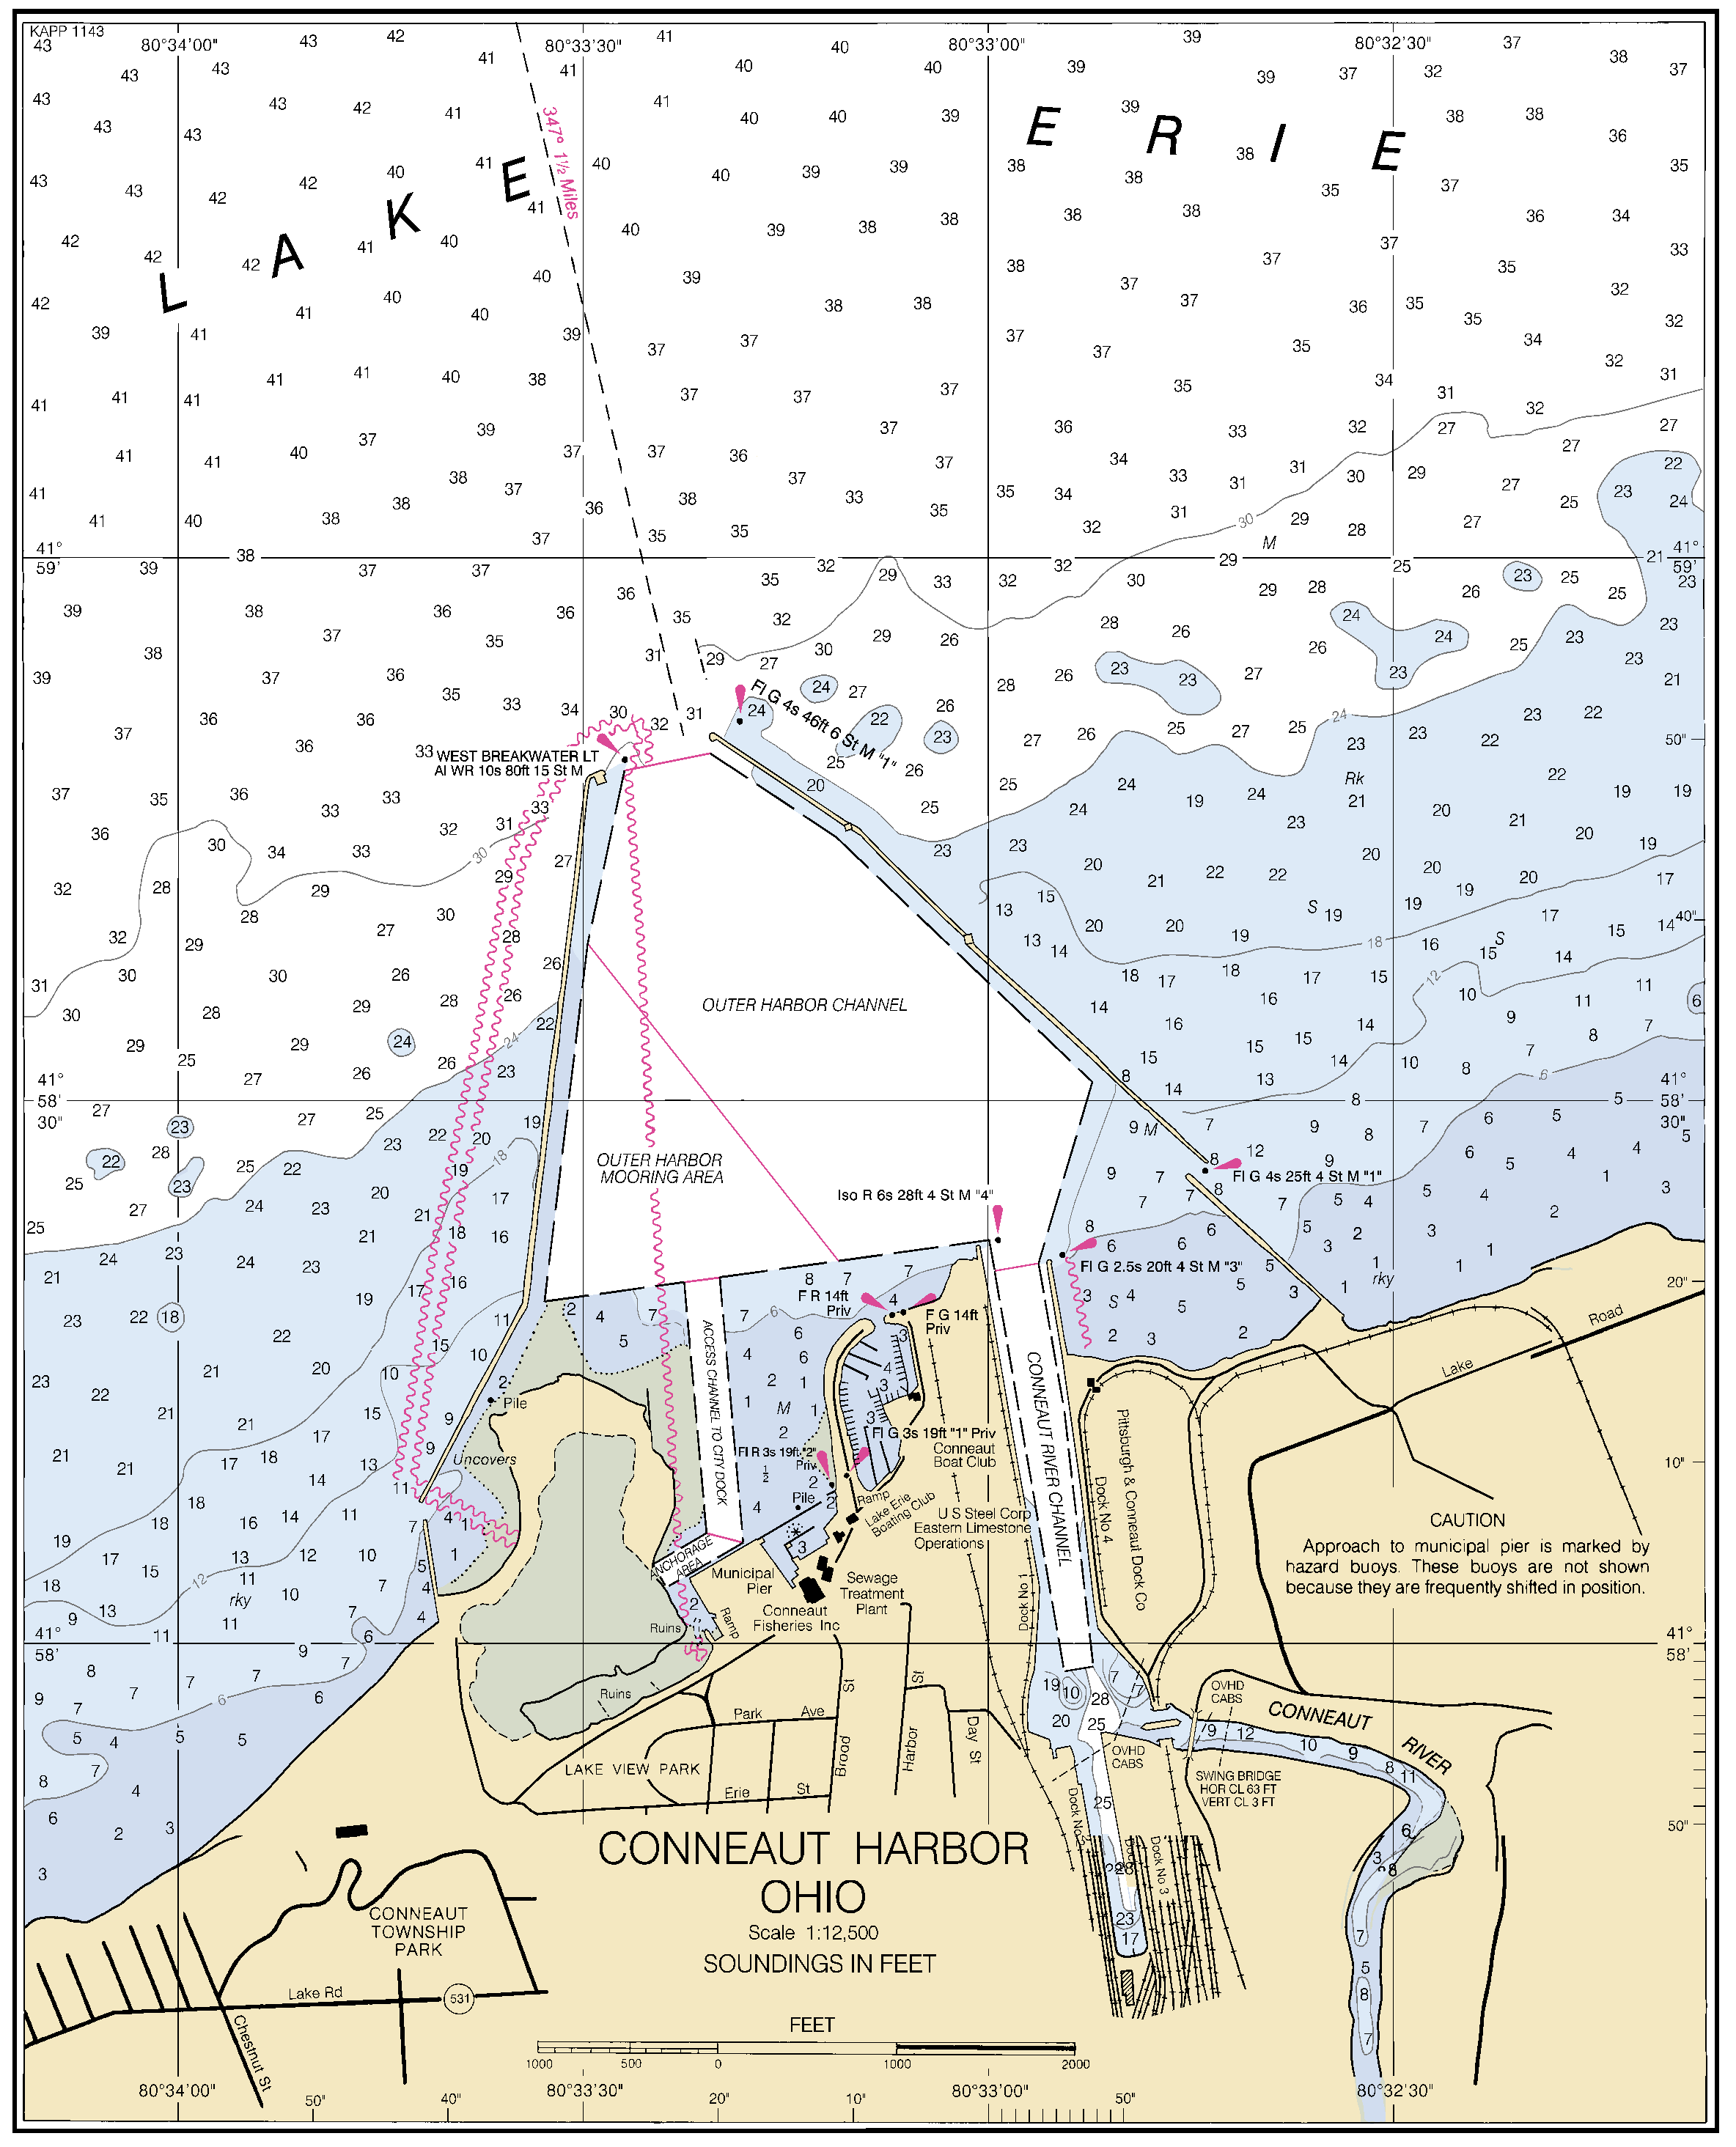 CONNEAUT HARBOR OHIO nautical chart - ΝΟΑΑ Charts - maps